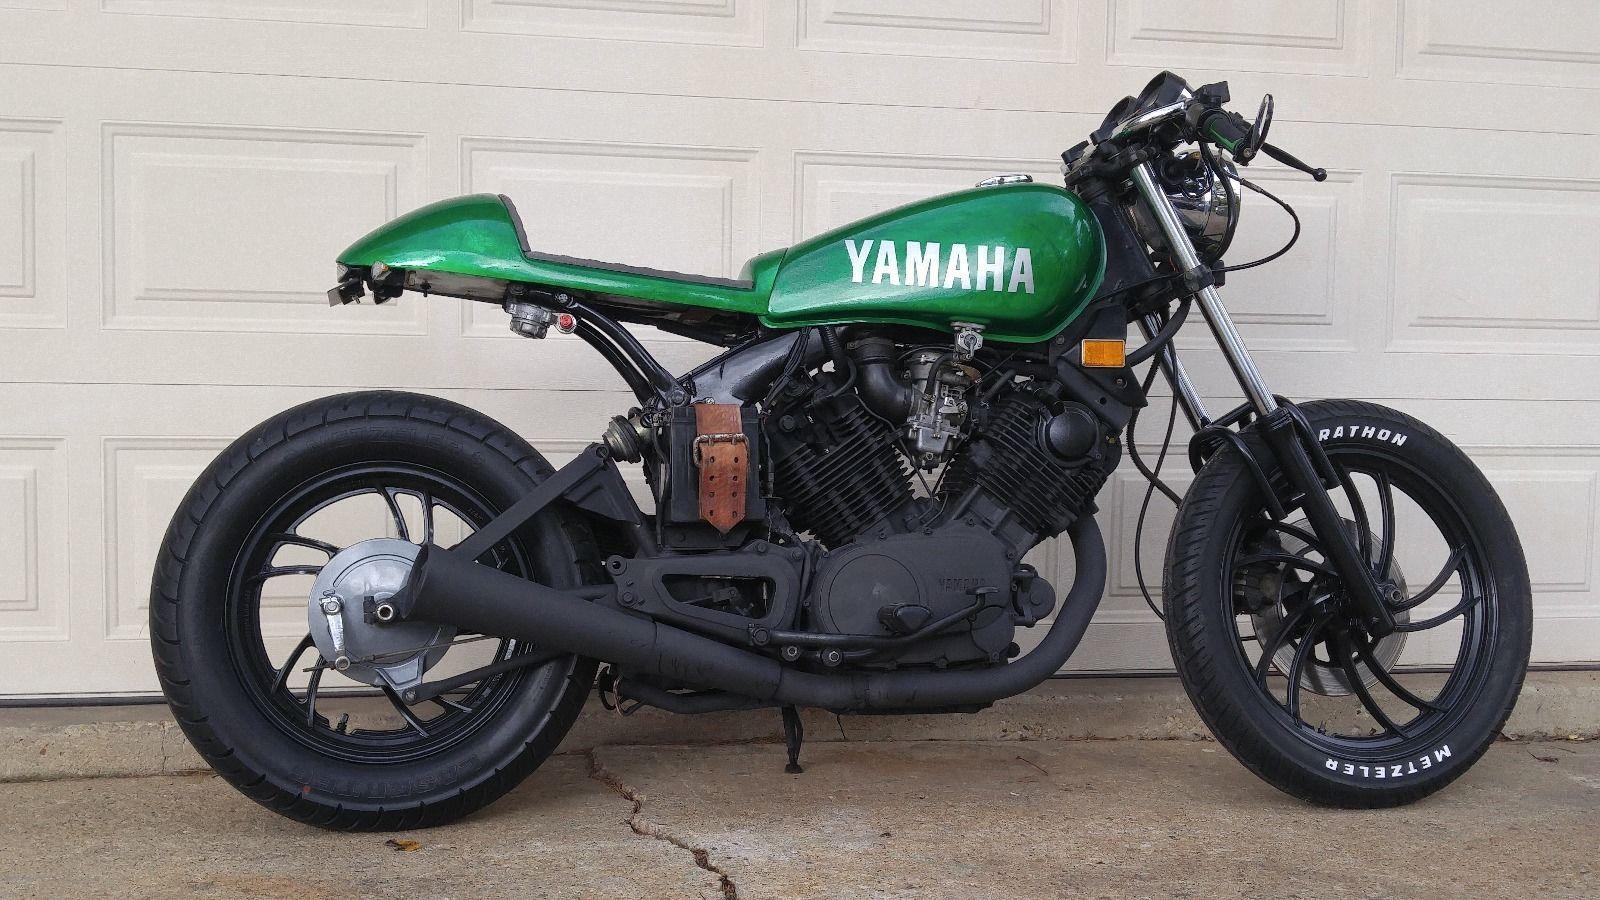 1983 Yamaha Virago Xv920 Cafe Racer Custom Build Custom Cafe Racer Motorcycles For Sale Yamaha Virago Custom Cafe Racer Yamaha Cafe Racer